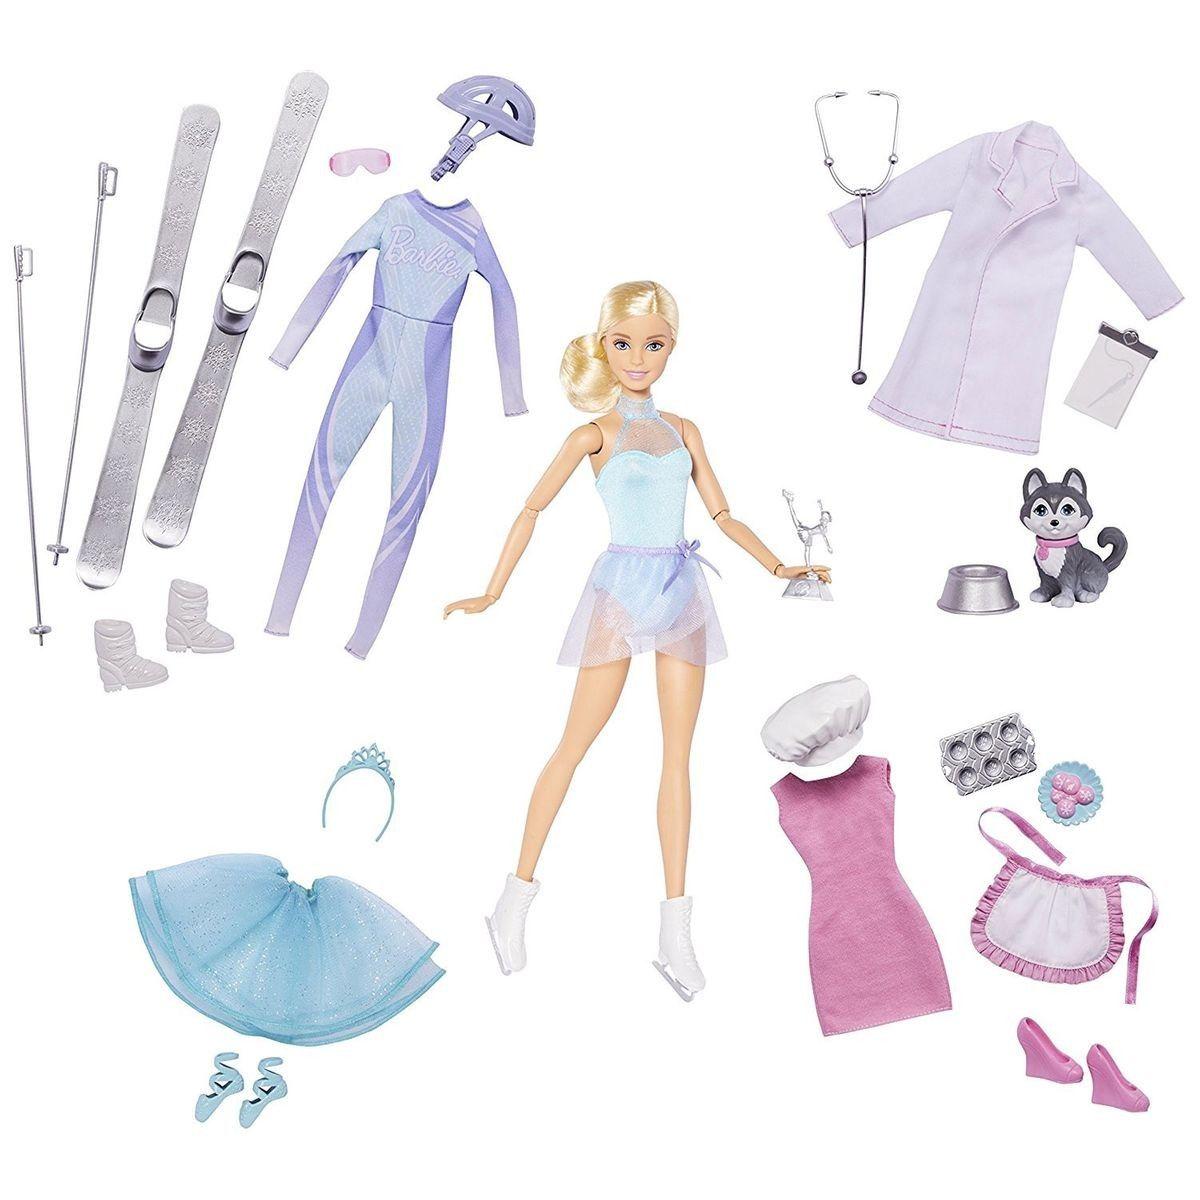 Calendrier Avent Barbie.Calendrier De L Avent Barbie In 2019 Products